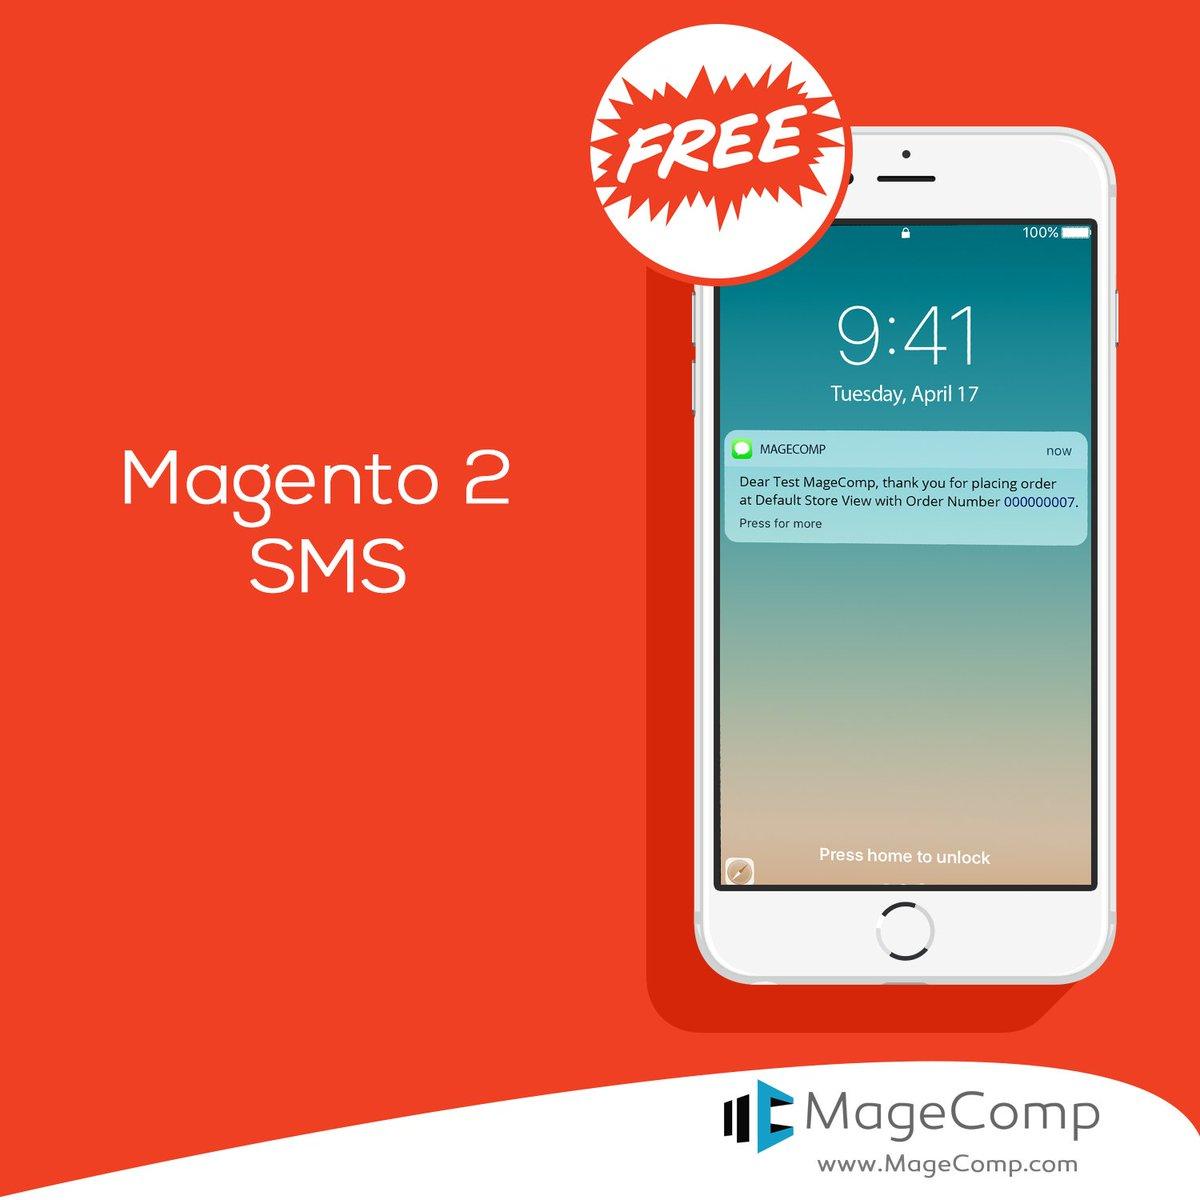 MageComp on Twitter: